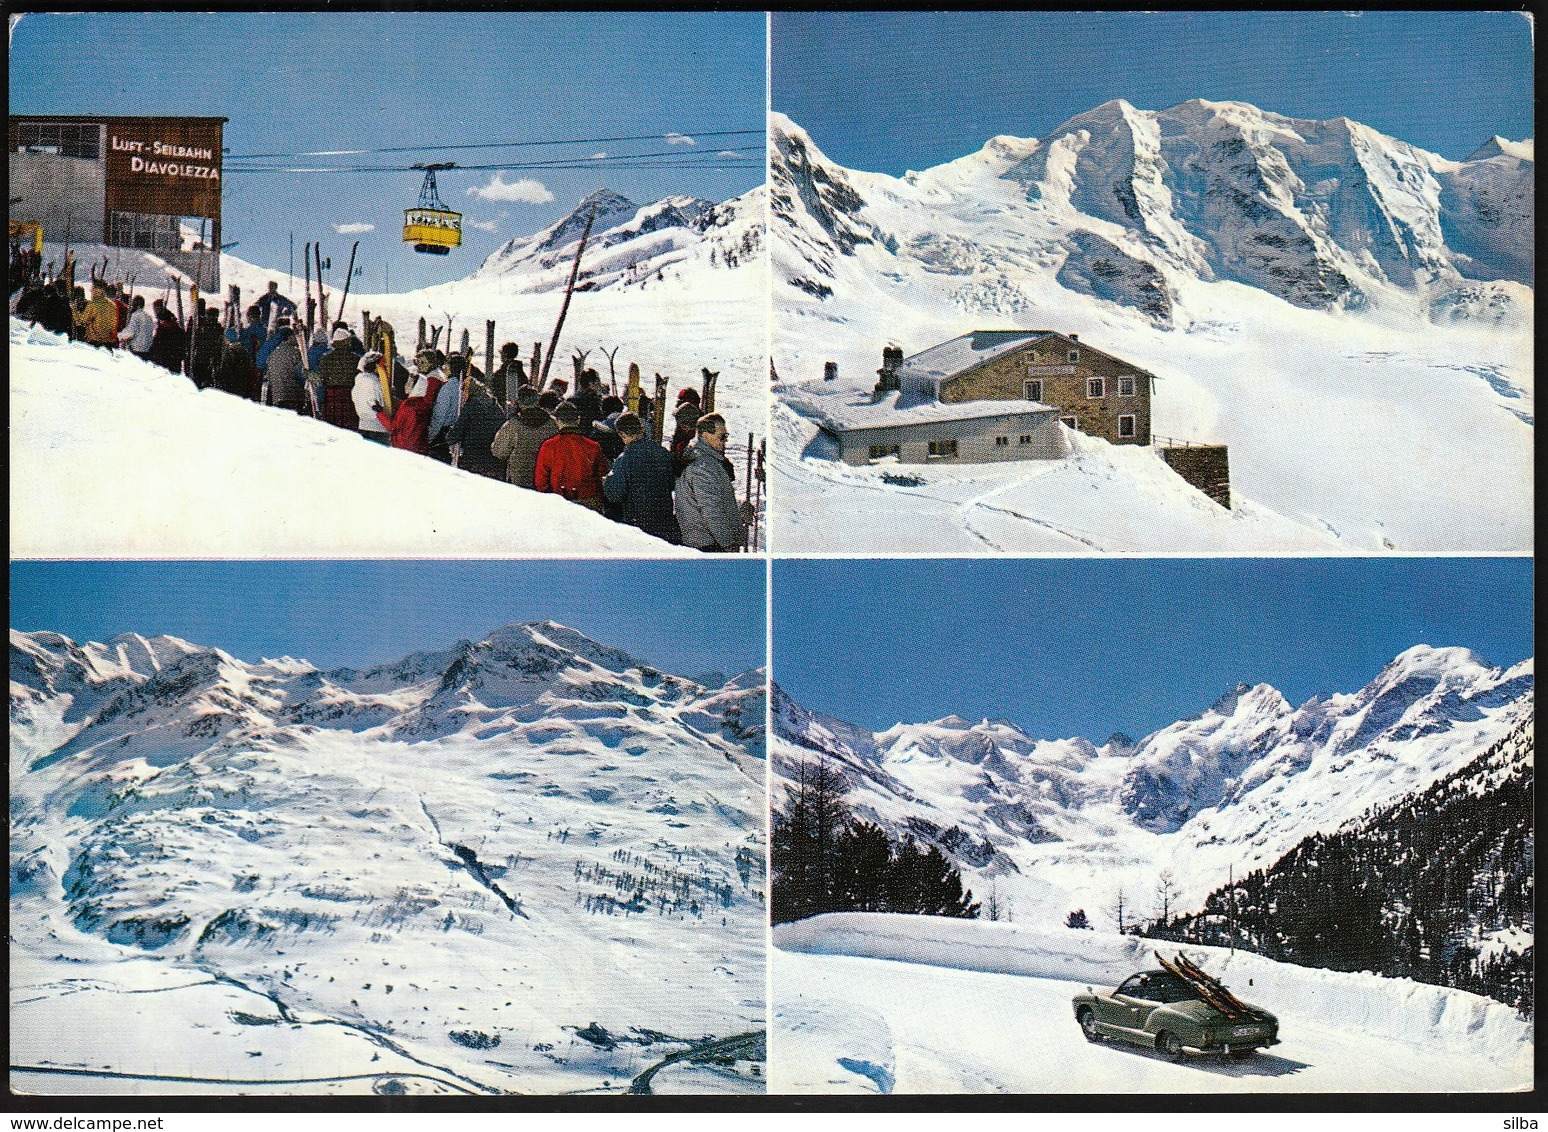 Switzerland 1969 Diavolezza Mit Piz Palu, Diavolezzabahn, Bernina / Cable Car, Gondolas / Tourism, Mountains - GR Grisons